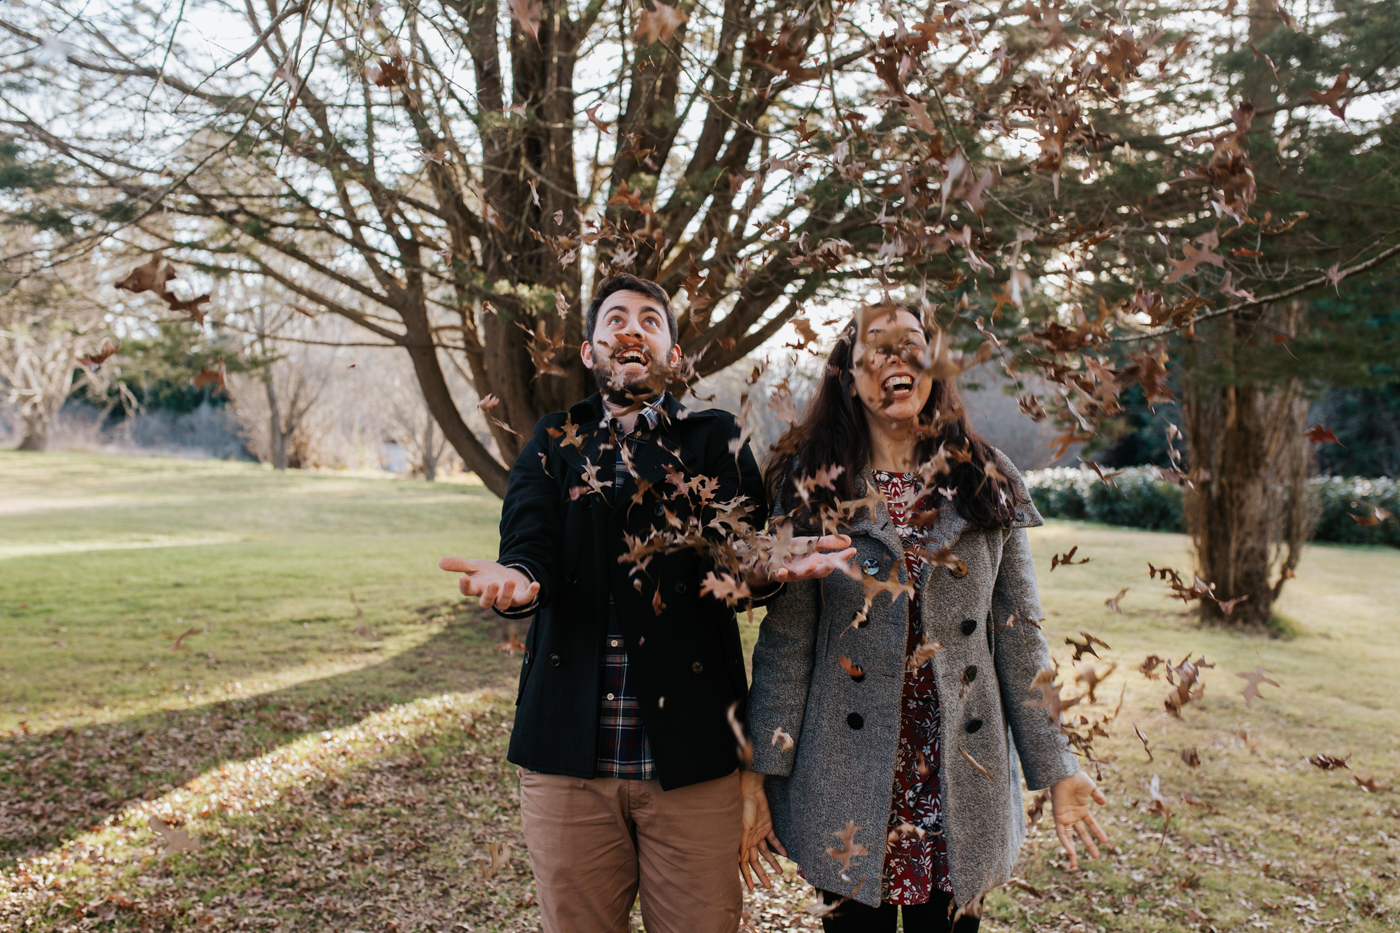 Kate & Kieran - Southern Highlands Engagement - Samantha Heather Photography-28.jpg